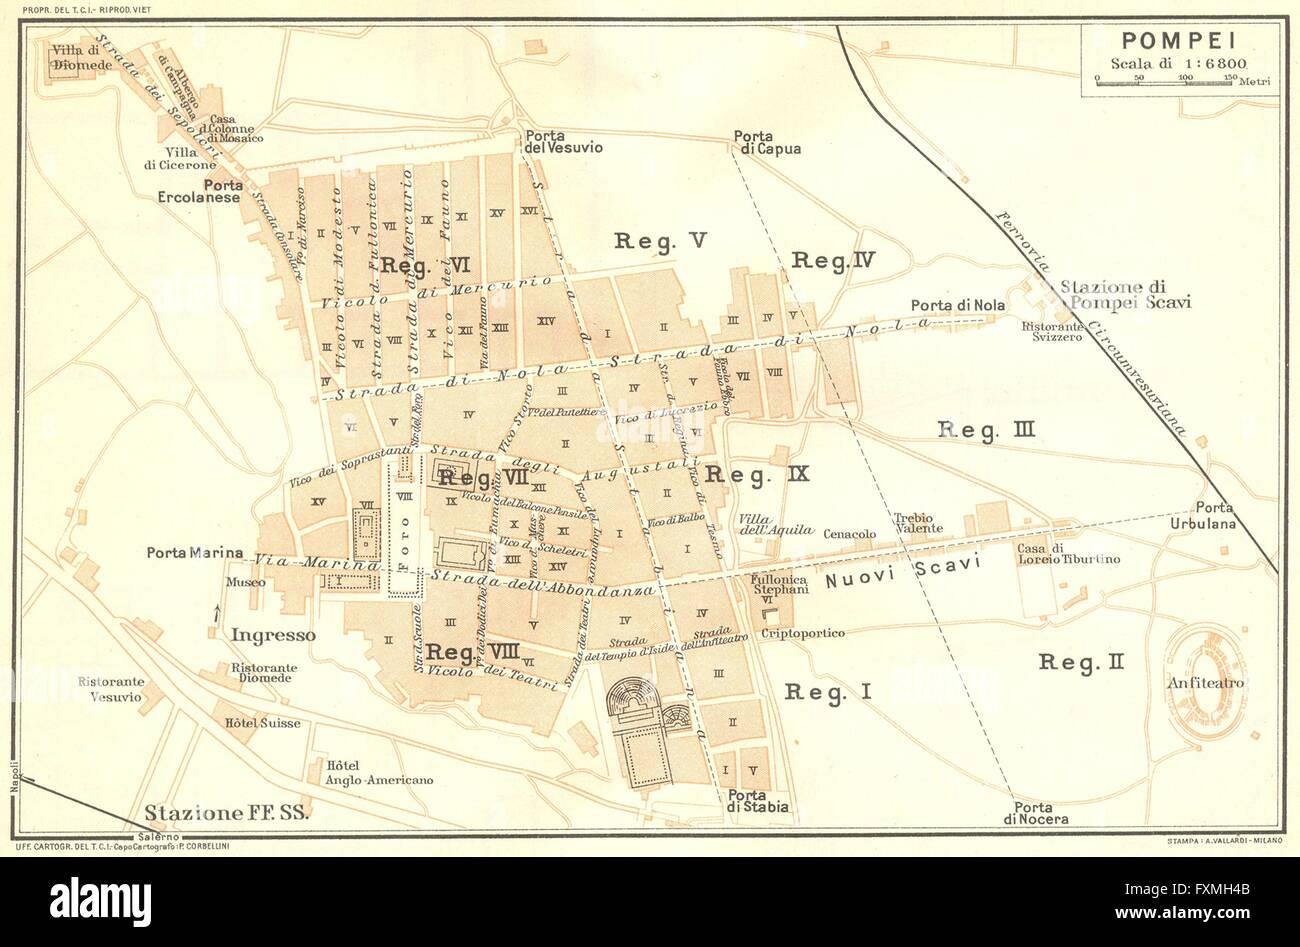 Where Is Pompeii On A Map Of Italy.Italy Pompeii 1925 Vintage Map Stock Photo 102485387 Alamy